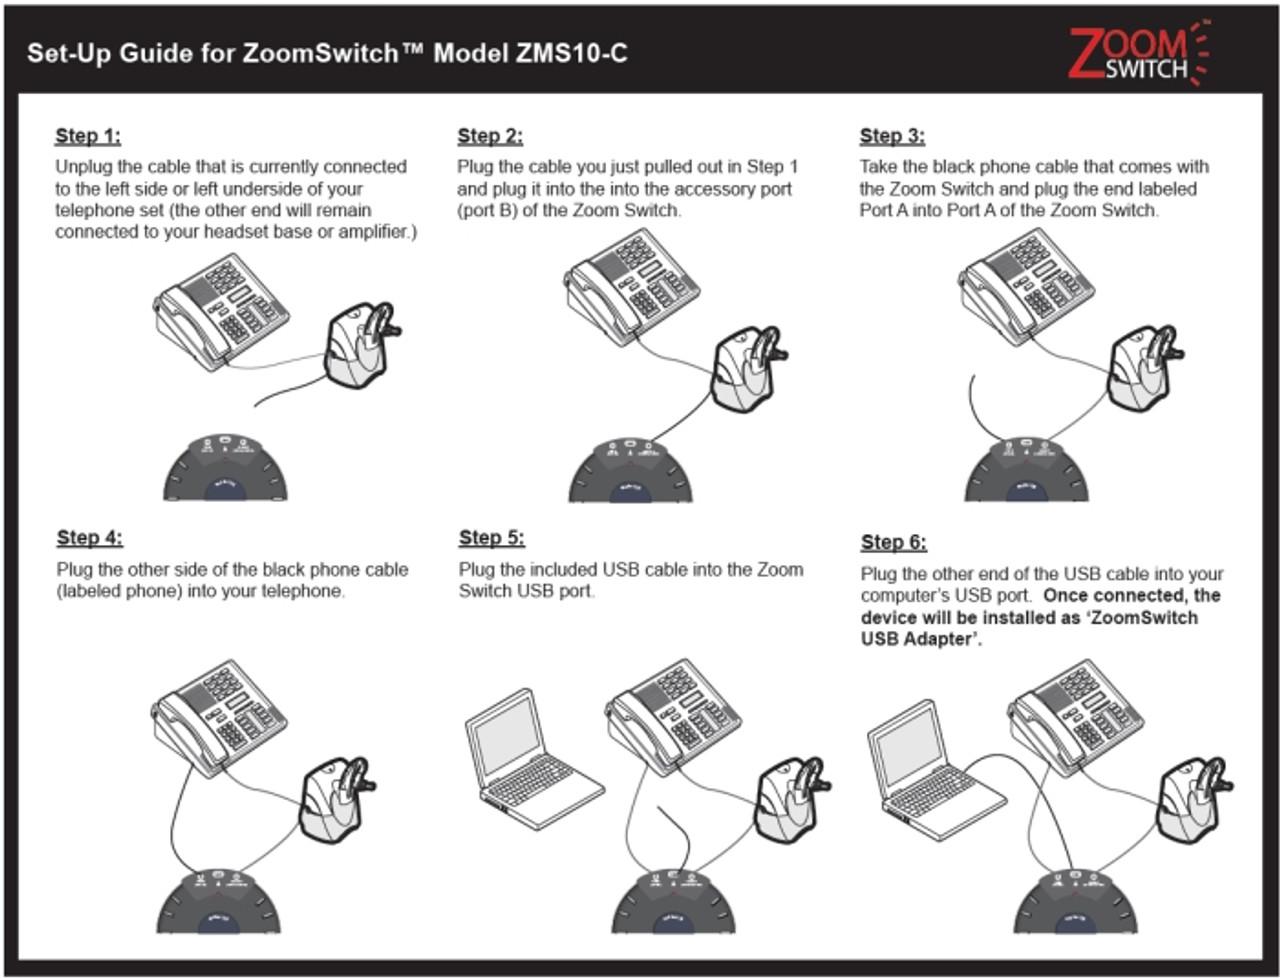 NEW! Zoom Switch ZMS20-UC Network Device